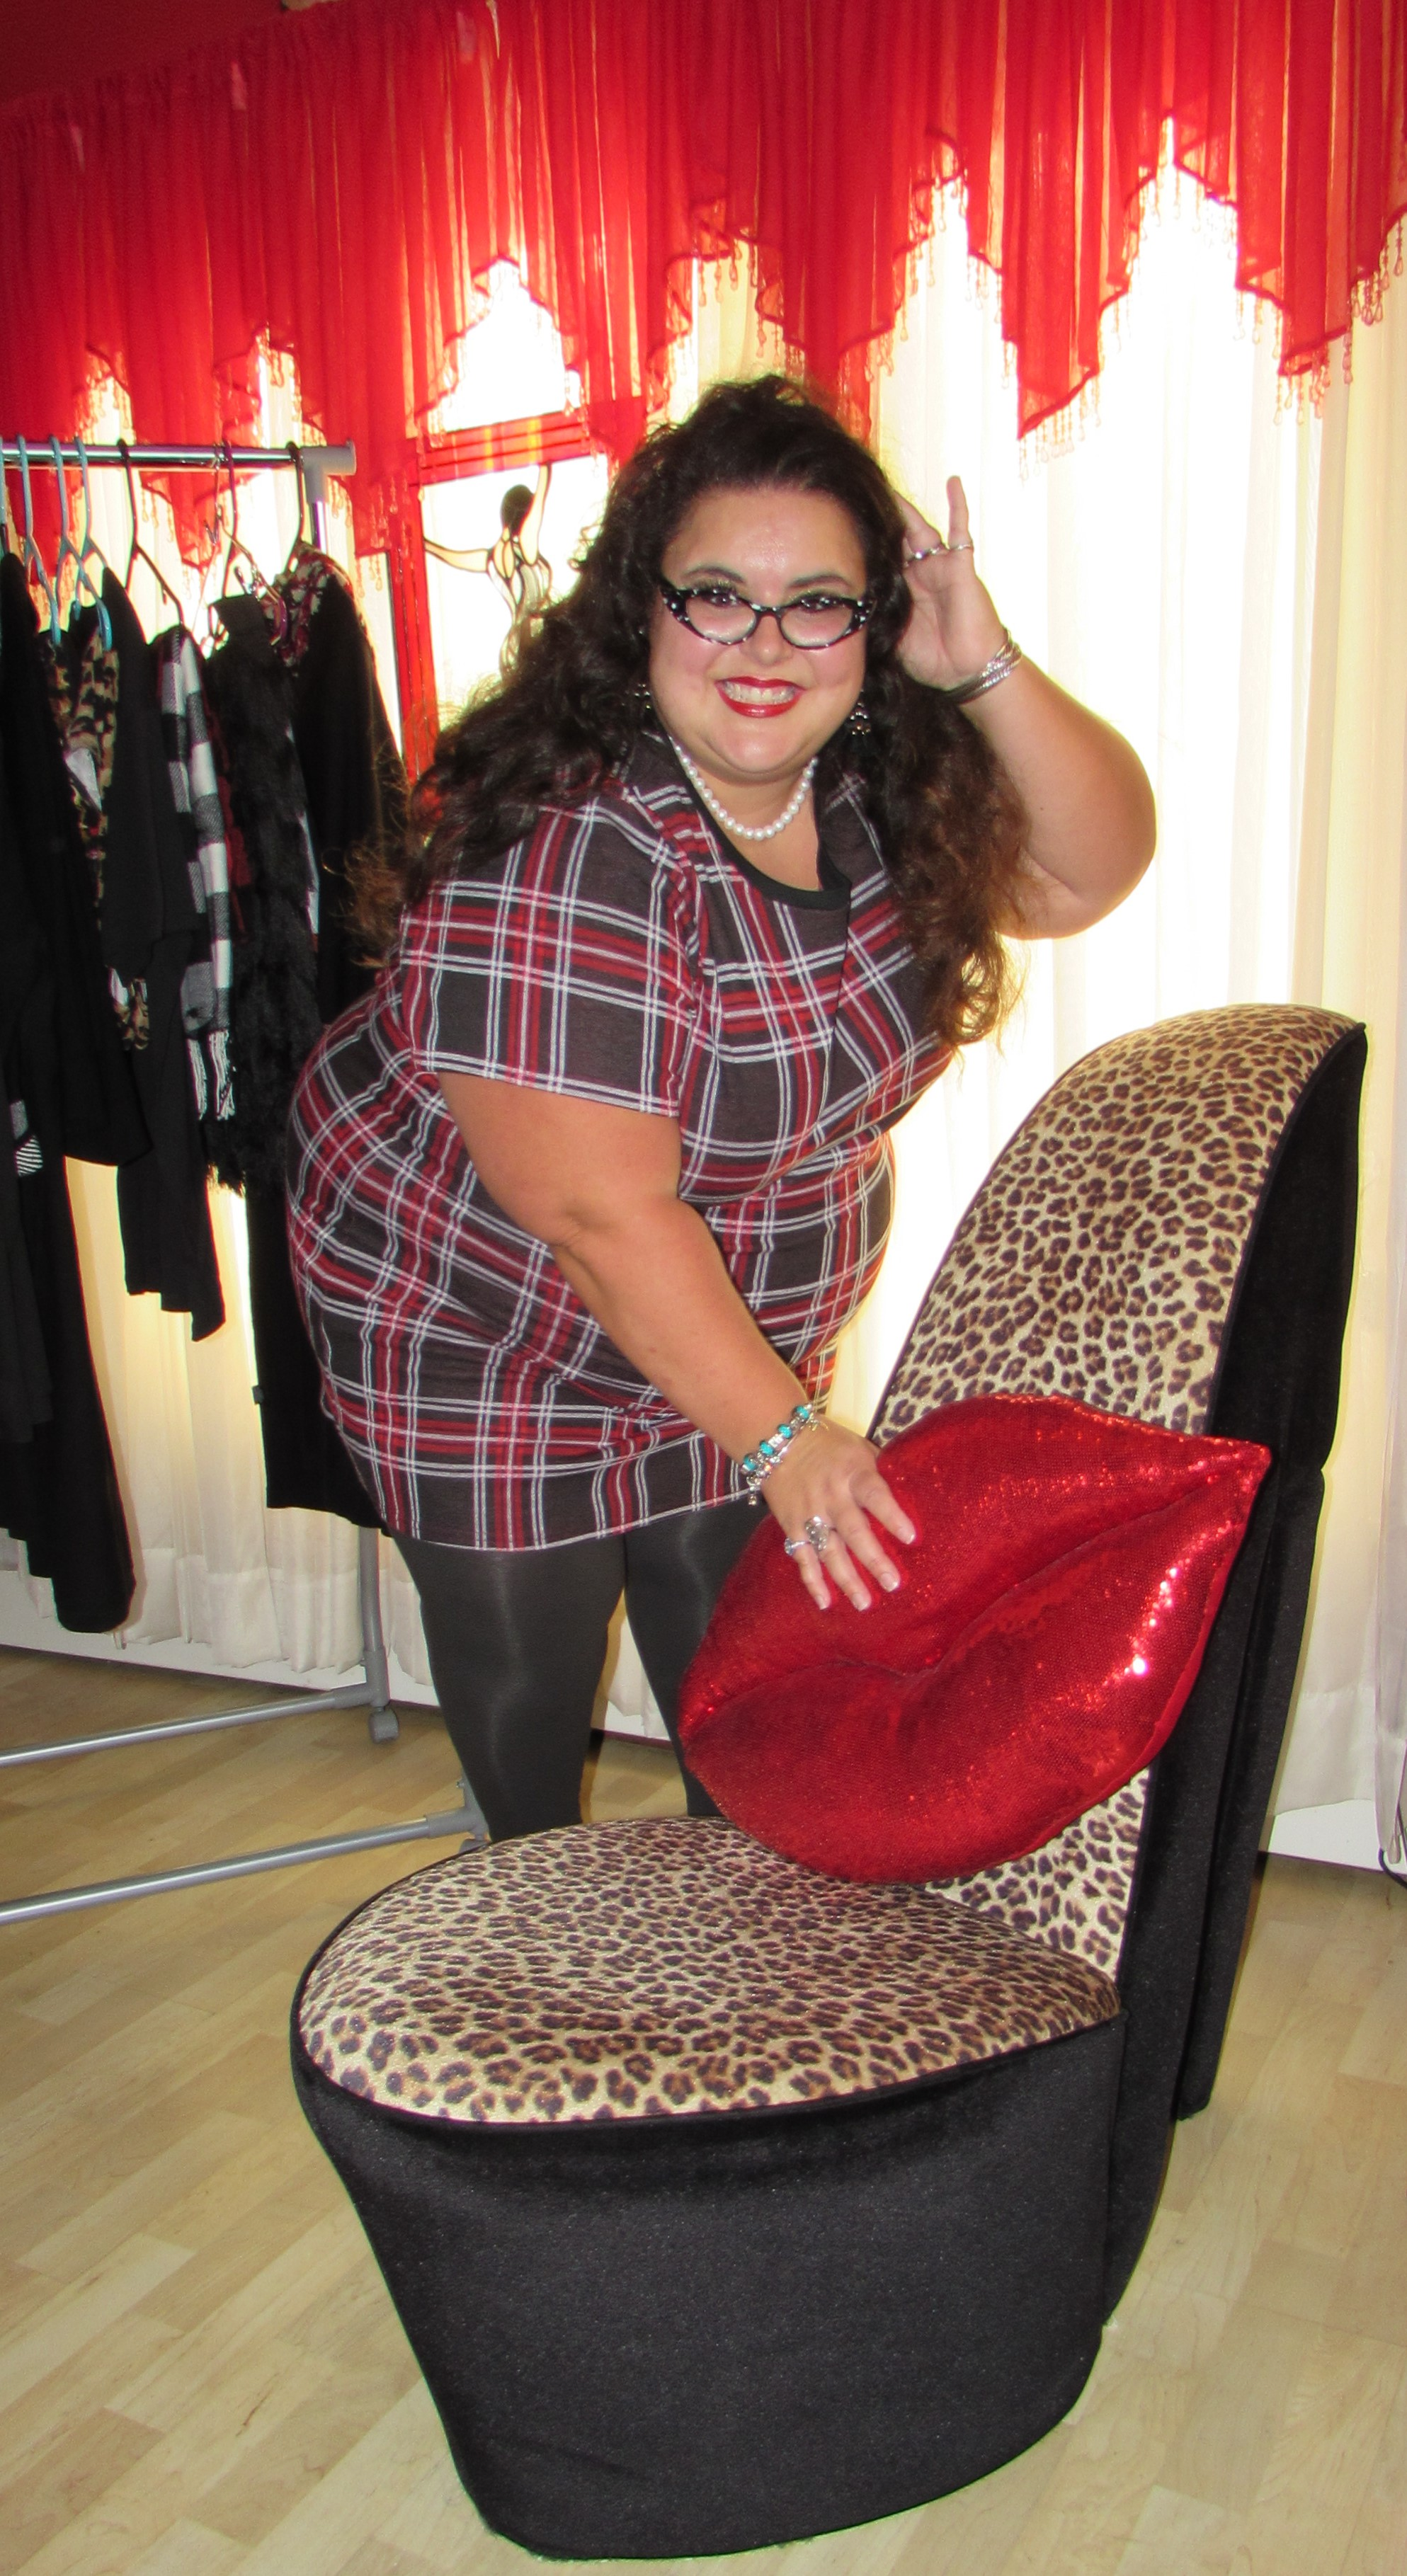 plaid dress pic for blog